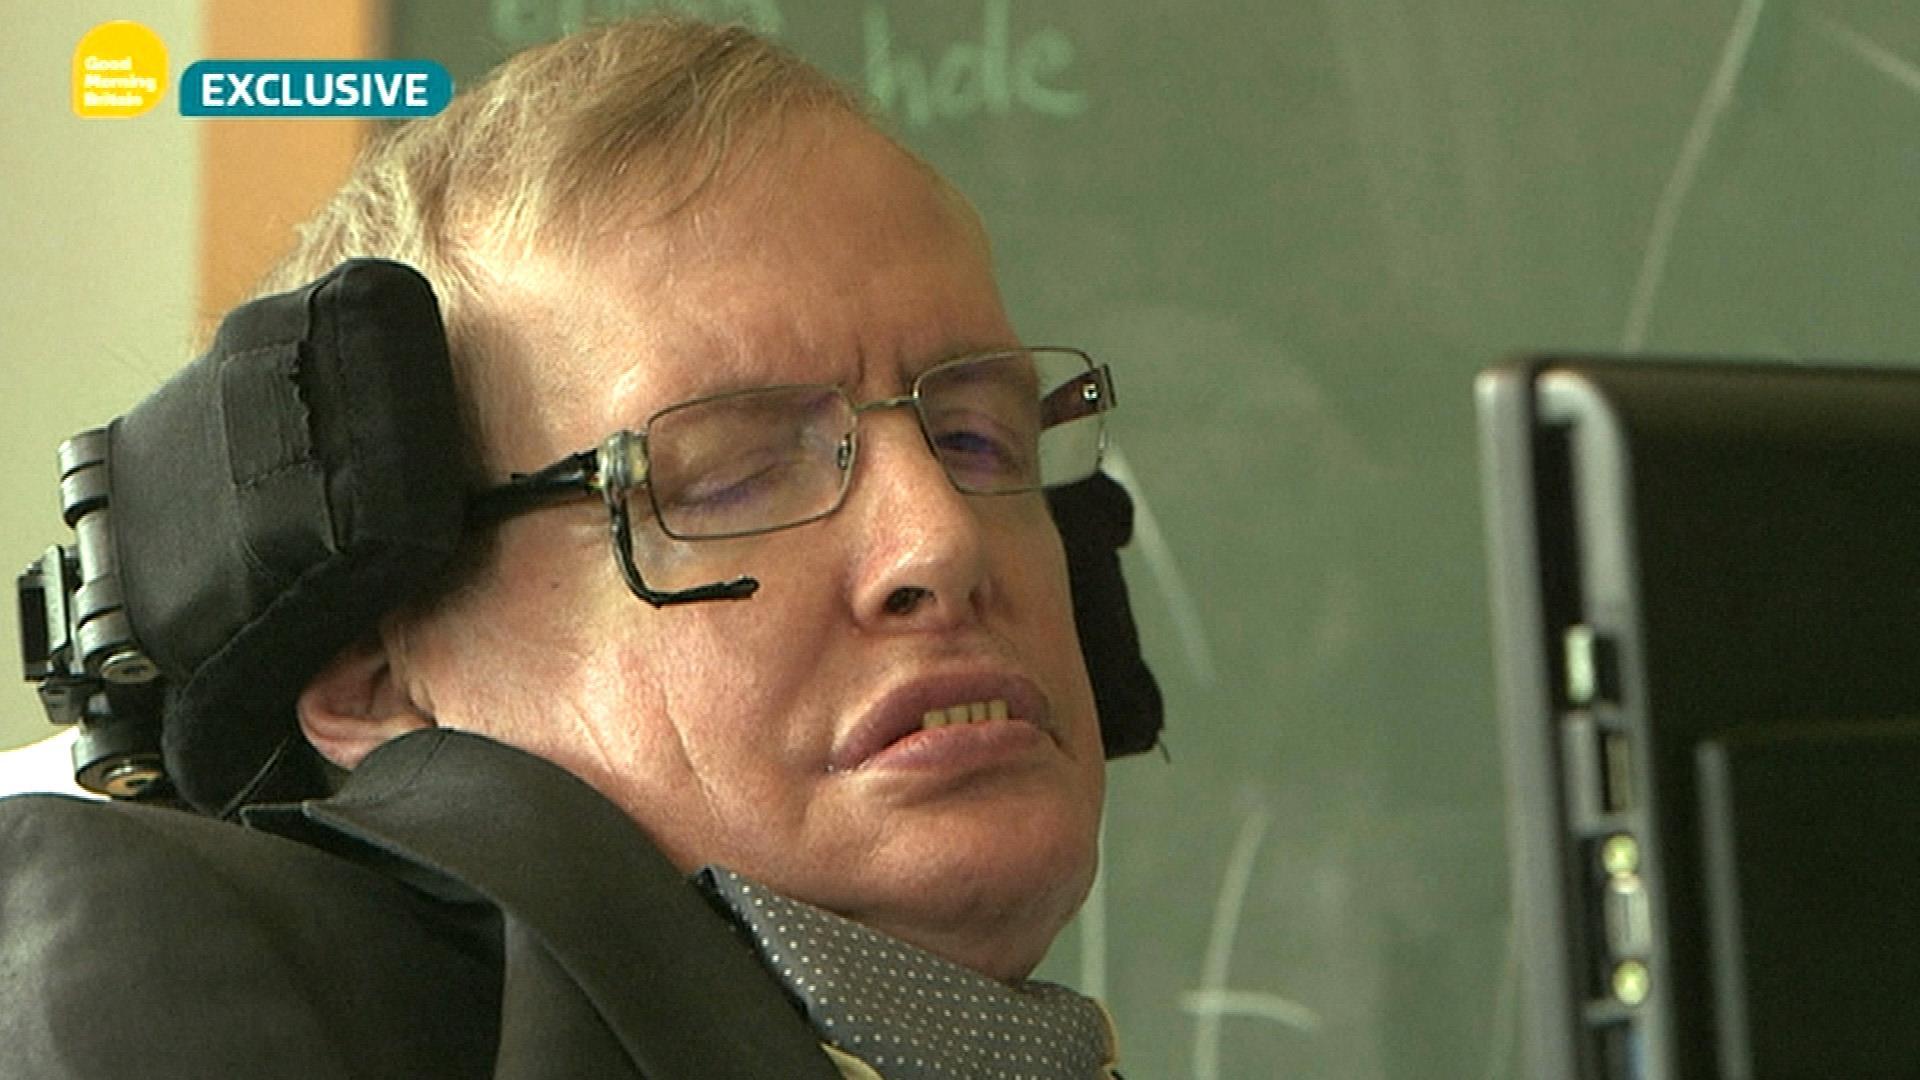 Stephen Hawking: Donald Trump Appeals to 'Lowest Common Denominator'